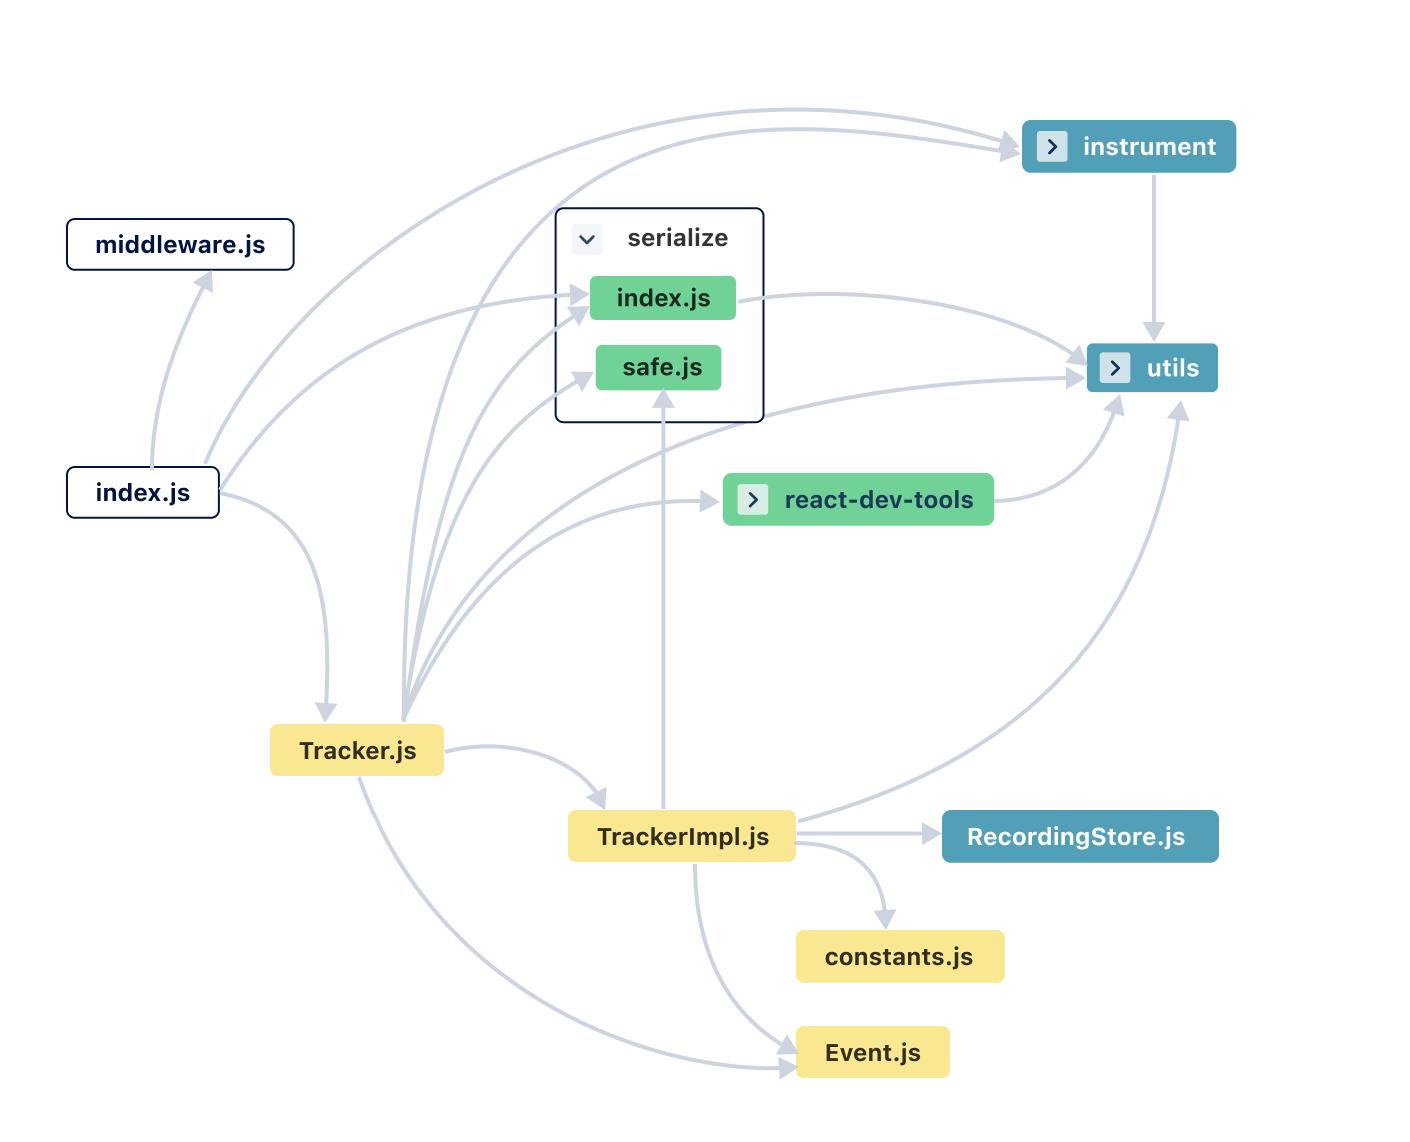 CodeSee Maps diagram